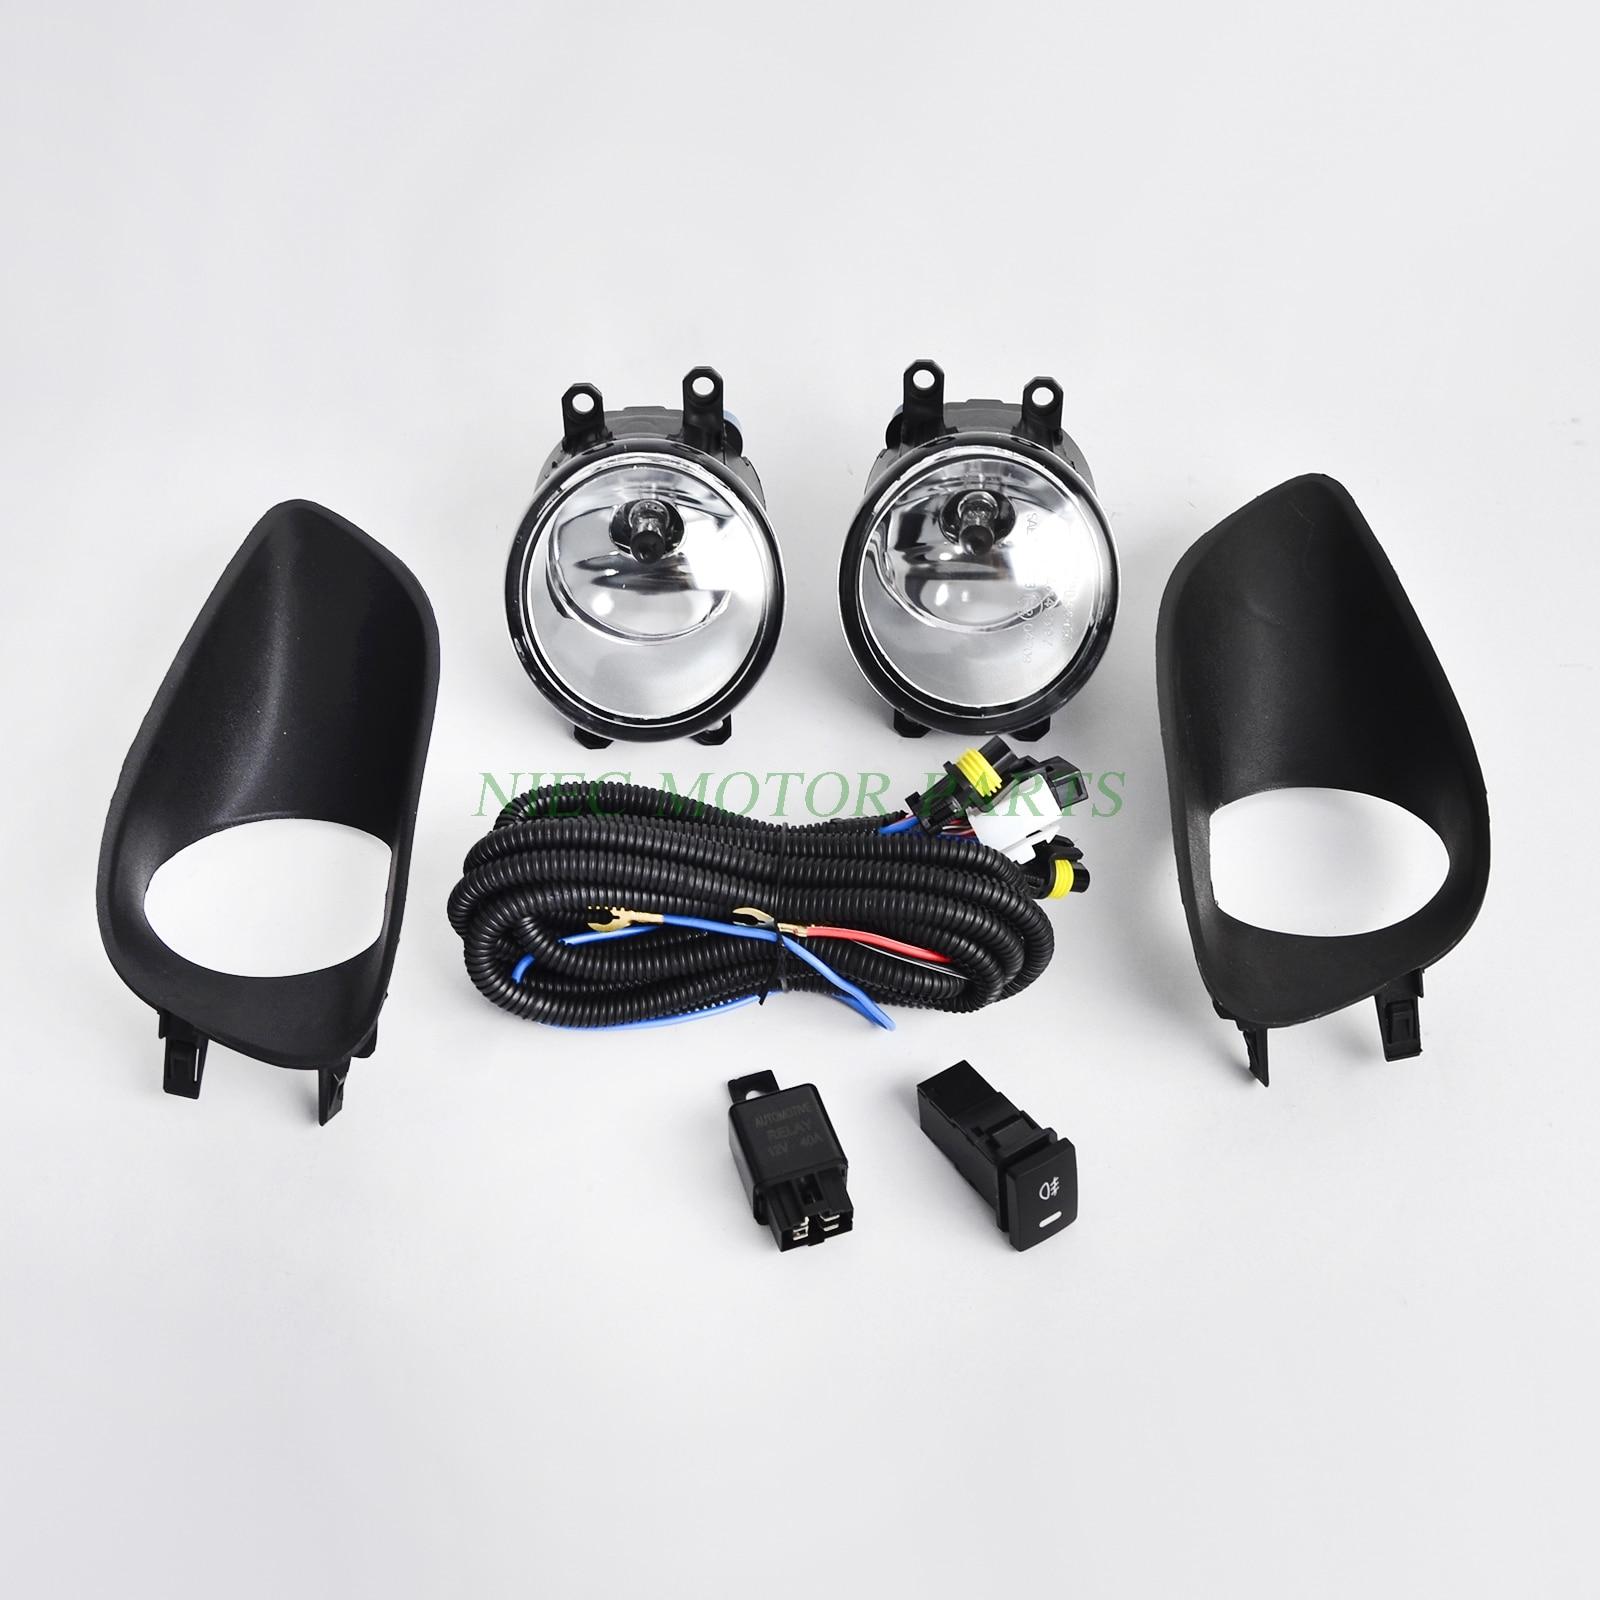 Pair Front Bumper Fog Light Clear w/ Switch For Toyota Yaris 06 11 Sedan 4 Door